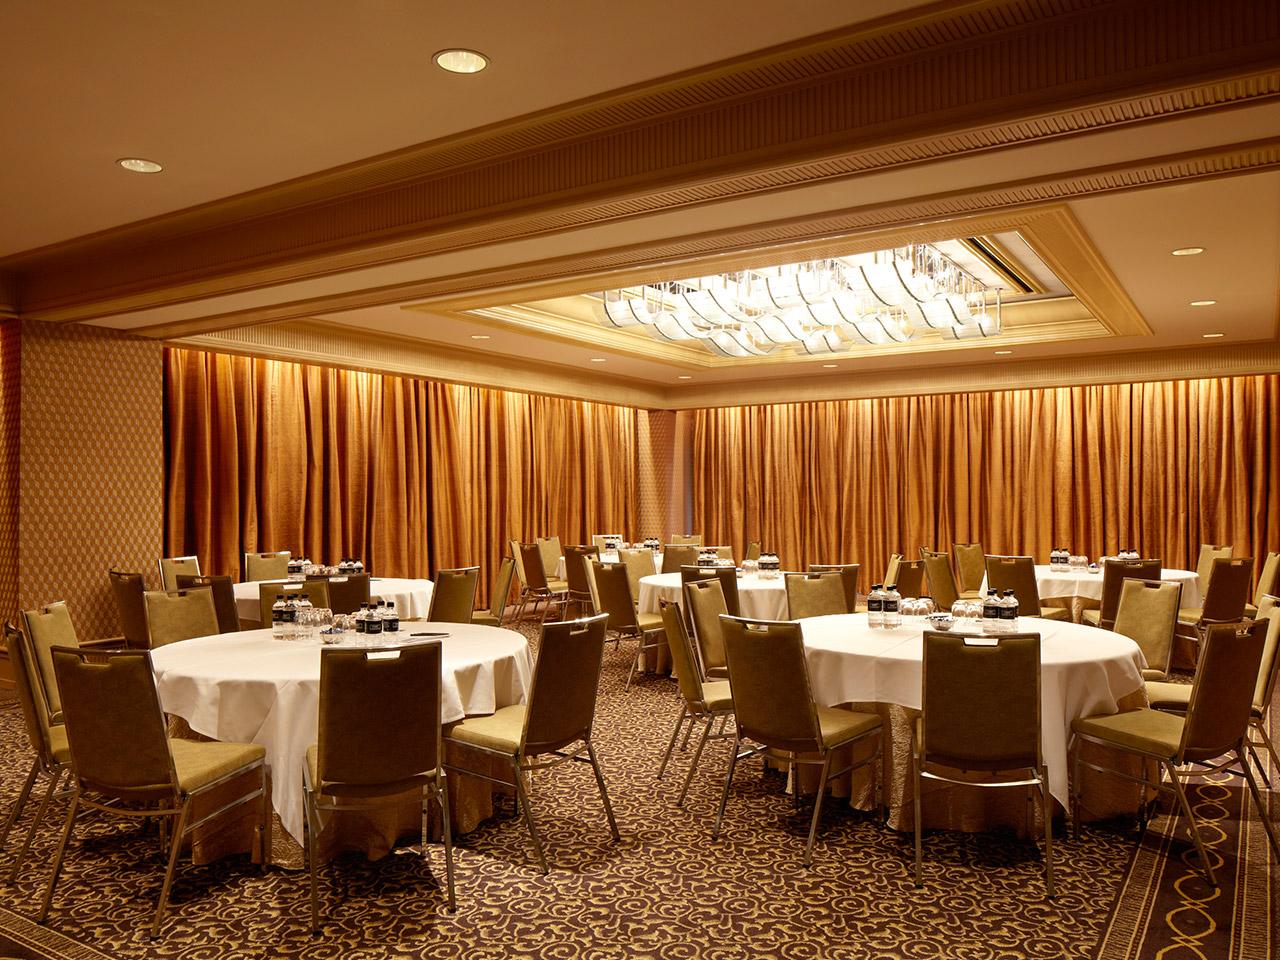 Banquet style function venue